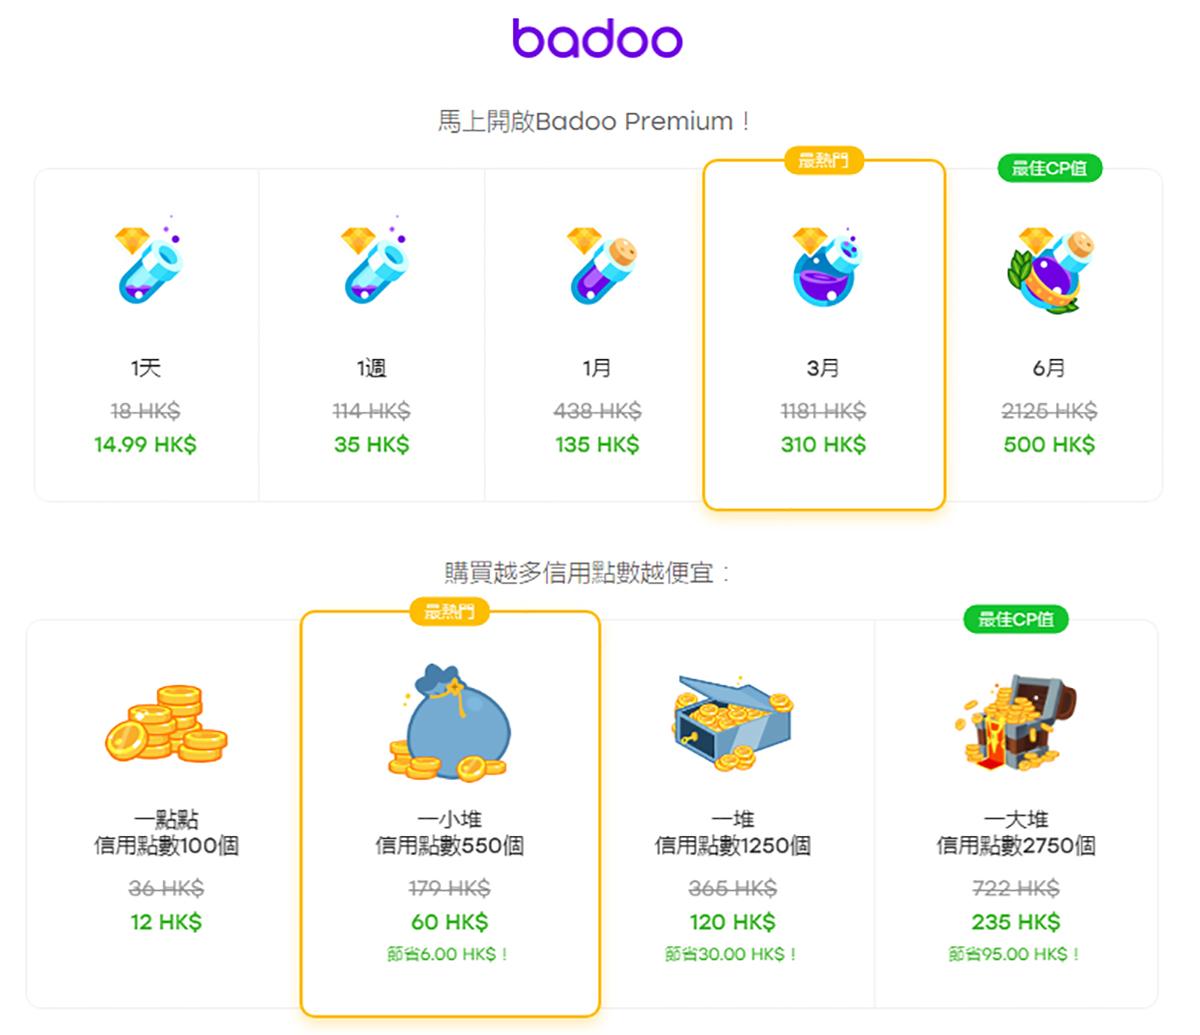 Badoo Price Table